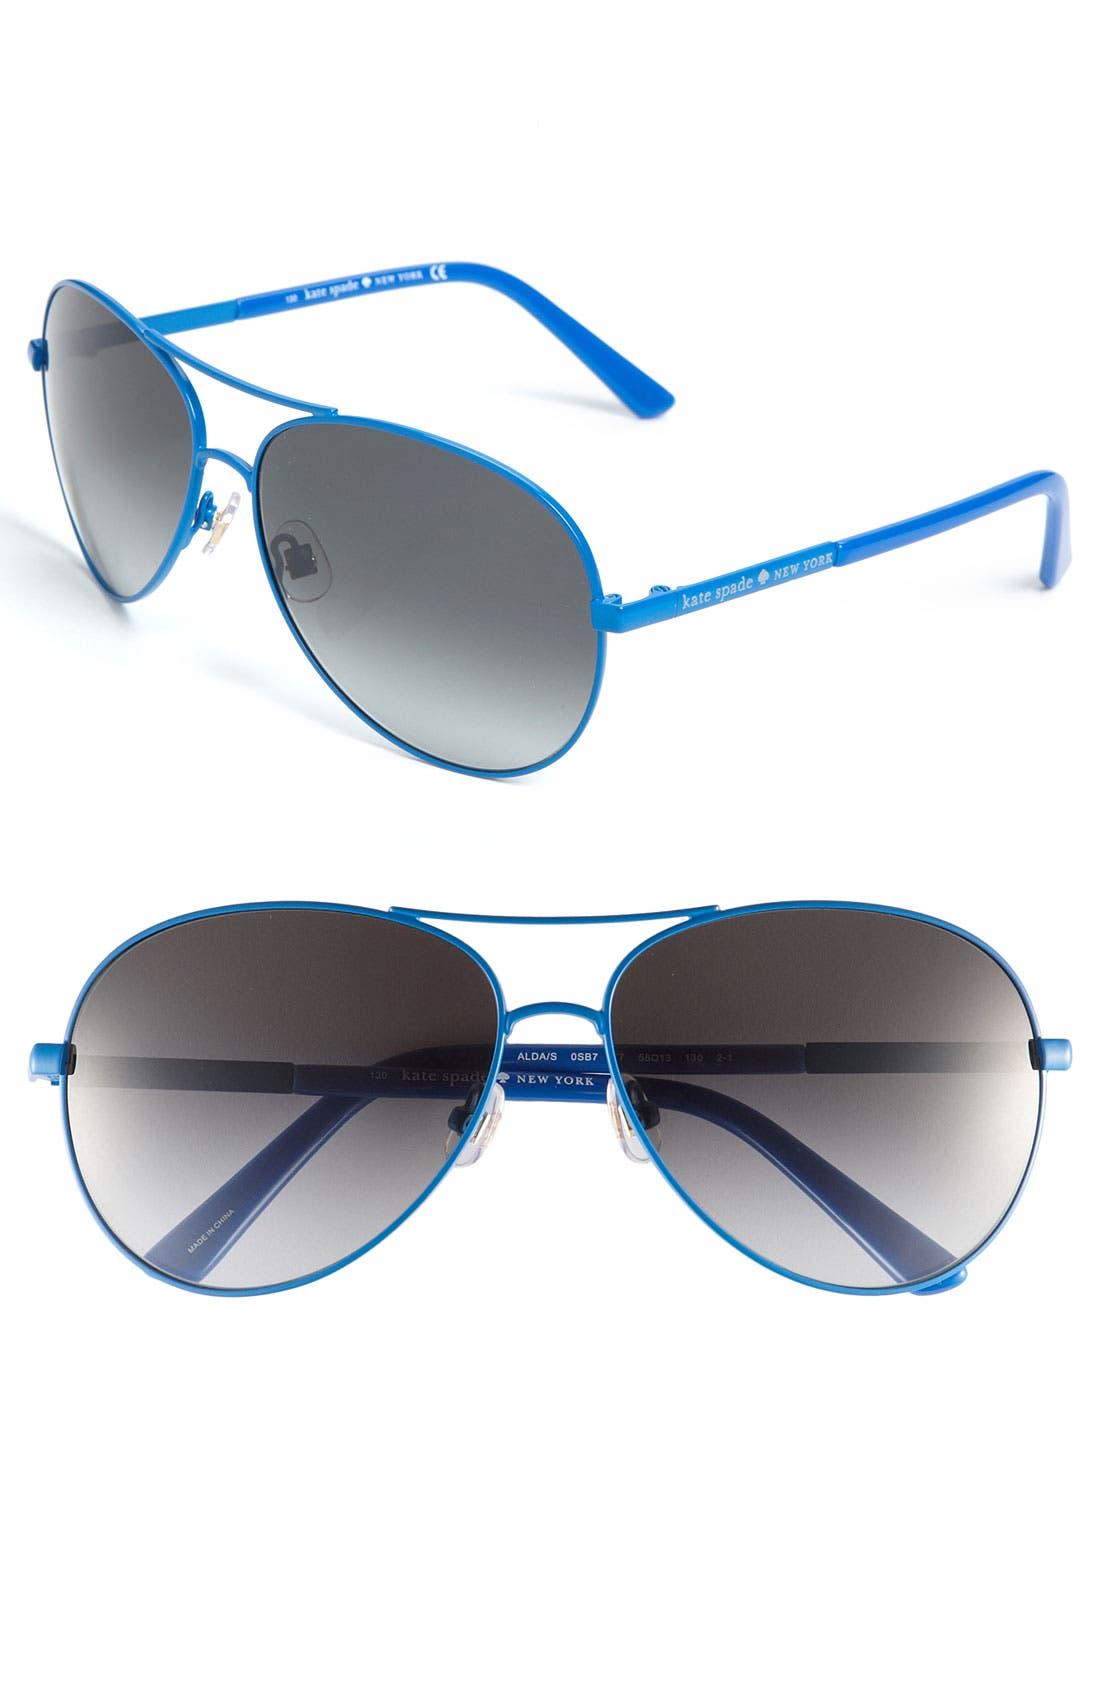 Main Image - kate spade new york metal aviator sunglasses